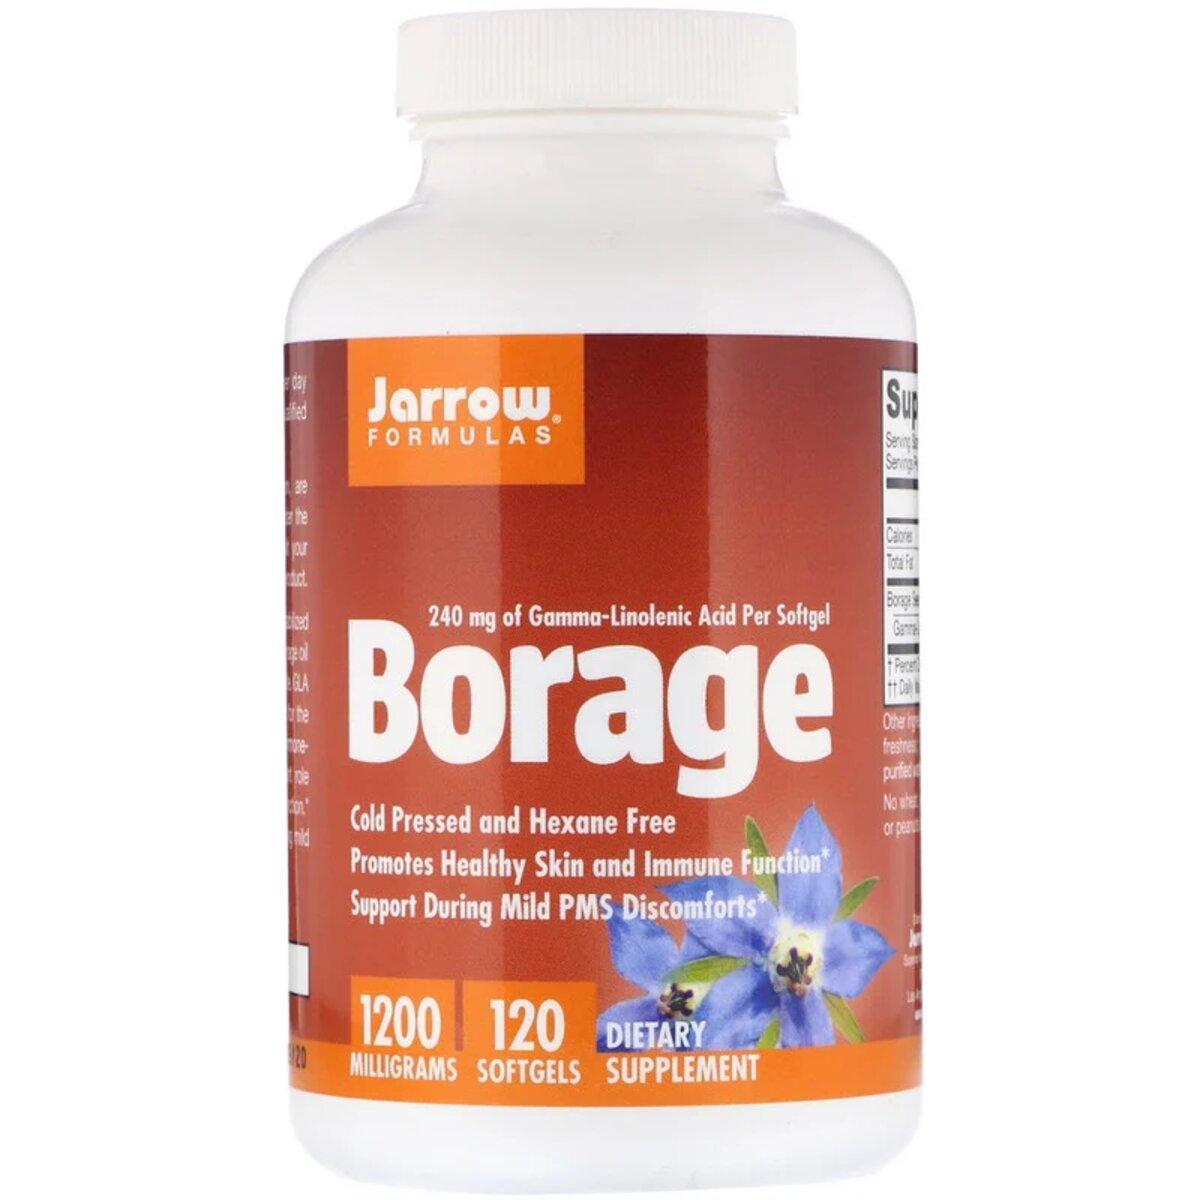 Бурачник (огуречная трава), Borage, GLA-240, 1200 мг, Jarrow Formulas, 120 мягких желатиновых капсул